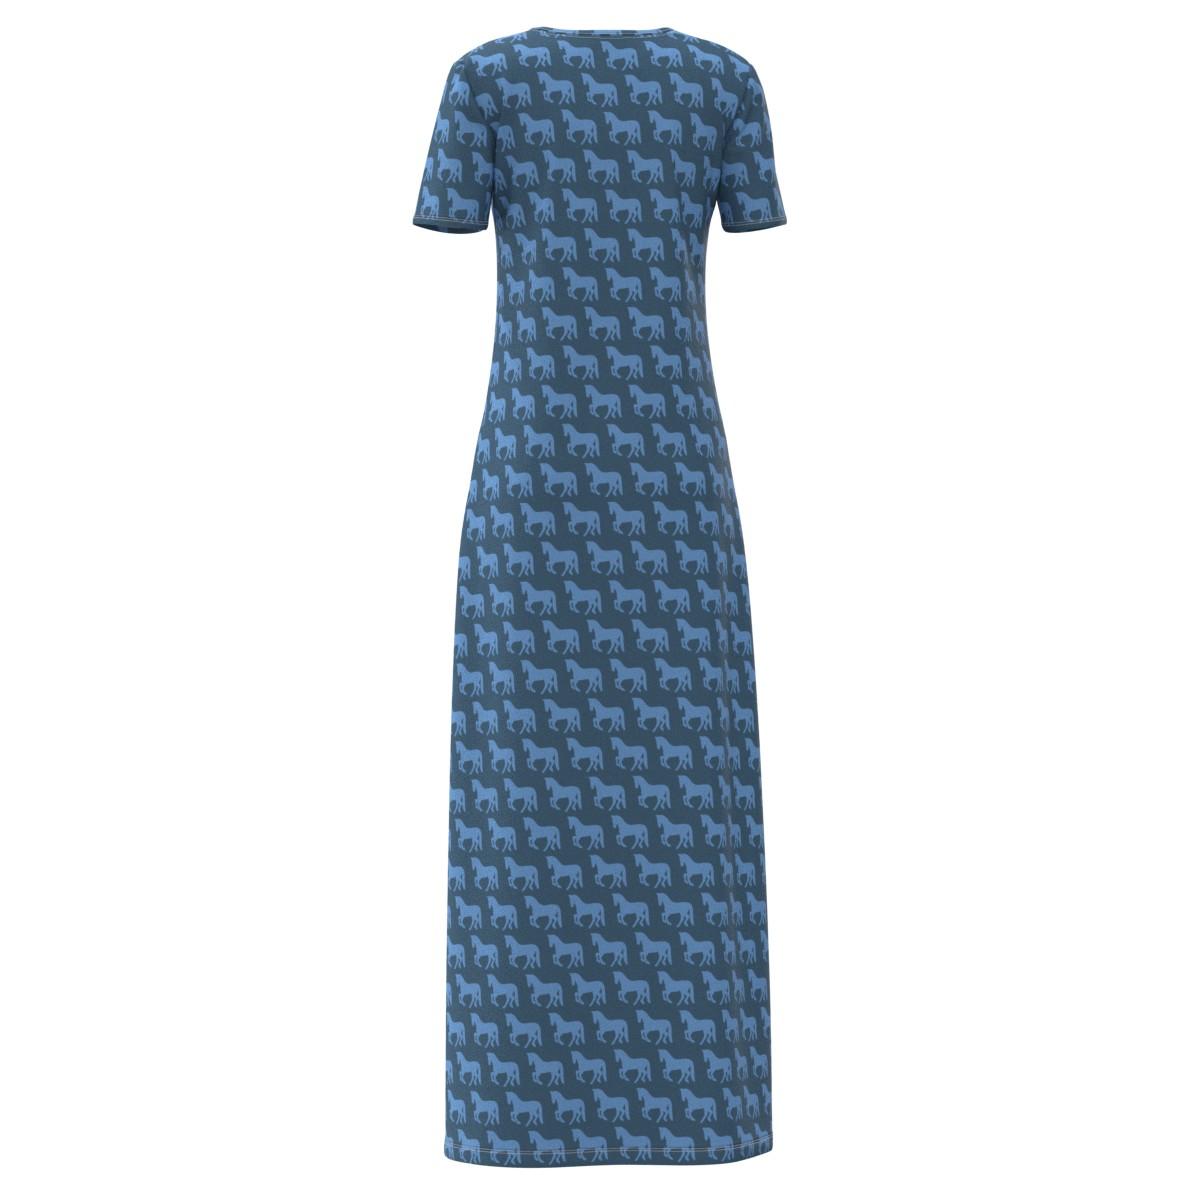 Horses Women Women Women Short Sleeve & Sleeveless Maxi Long Dress Size XS-5XL Plus 93a666